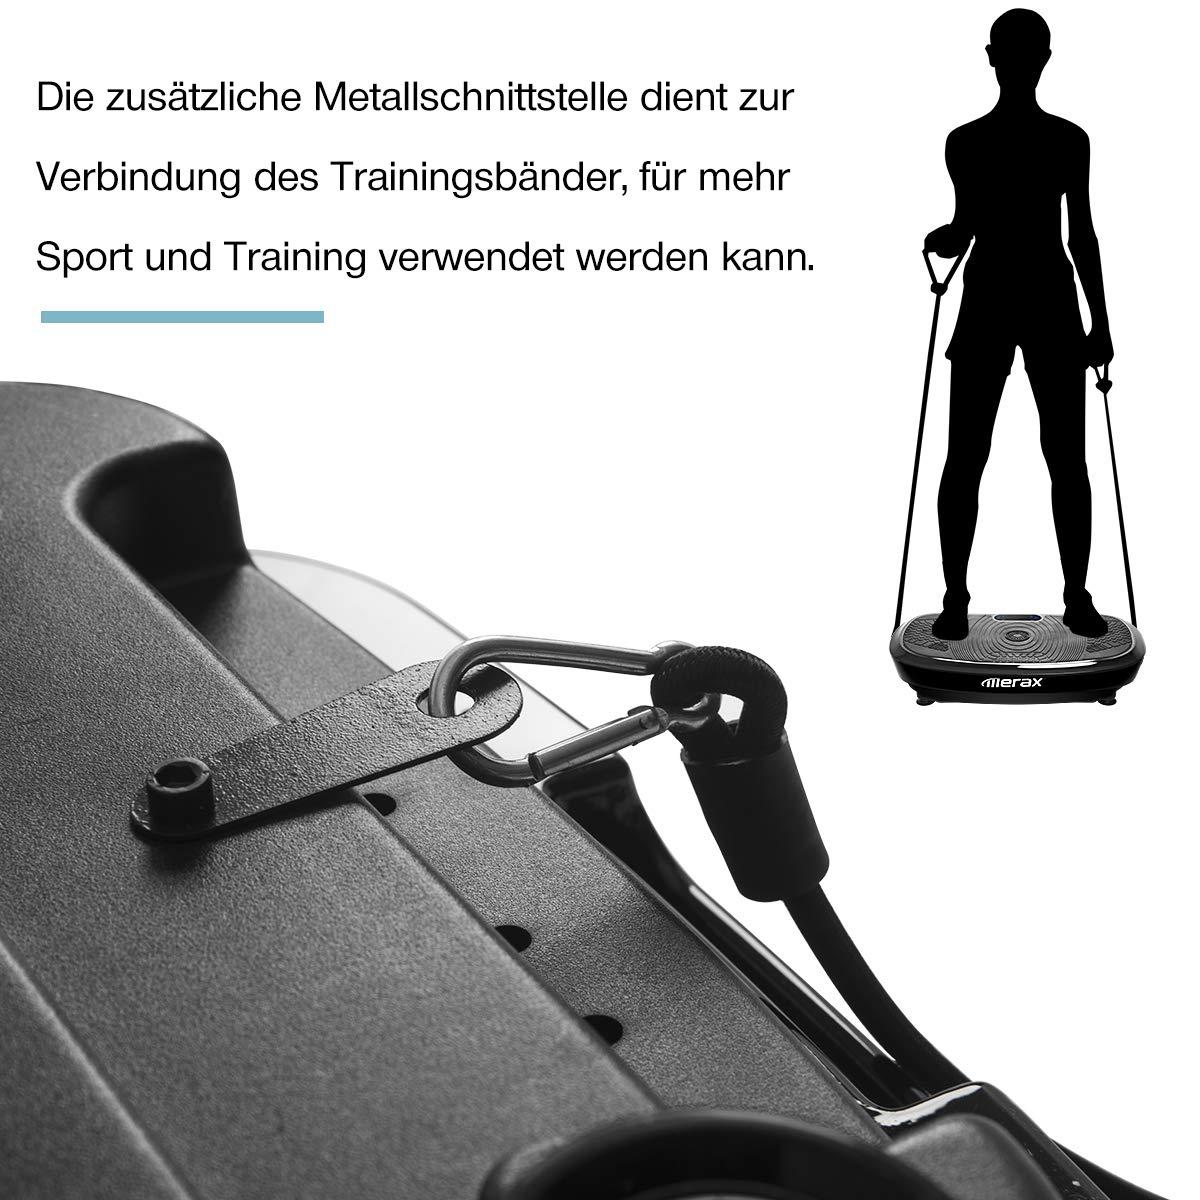 Ganzk/örper Trainingsger/ät mit 2x200W Motoren Trainingsb/änder Fernbedienung Merax Profi Vibrationsplatte mit 3D Wipp Vibrations Technologie Riesige Fl/äche Bluetooth Musik